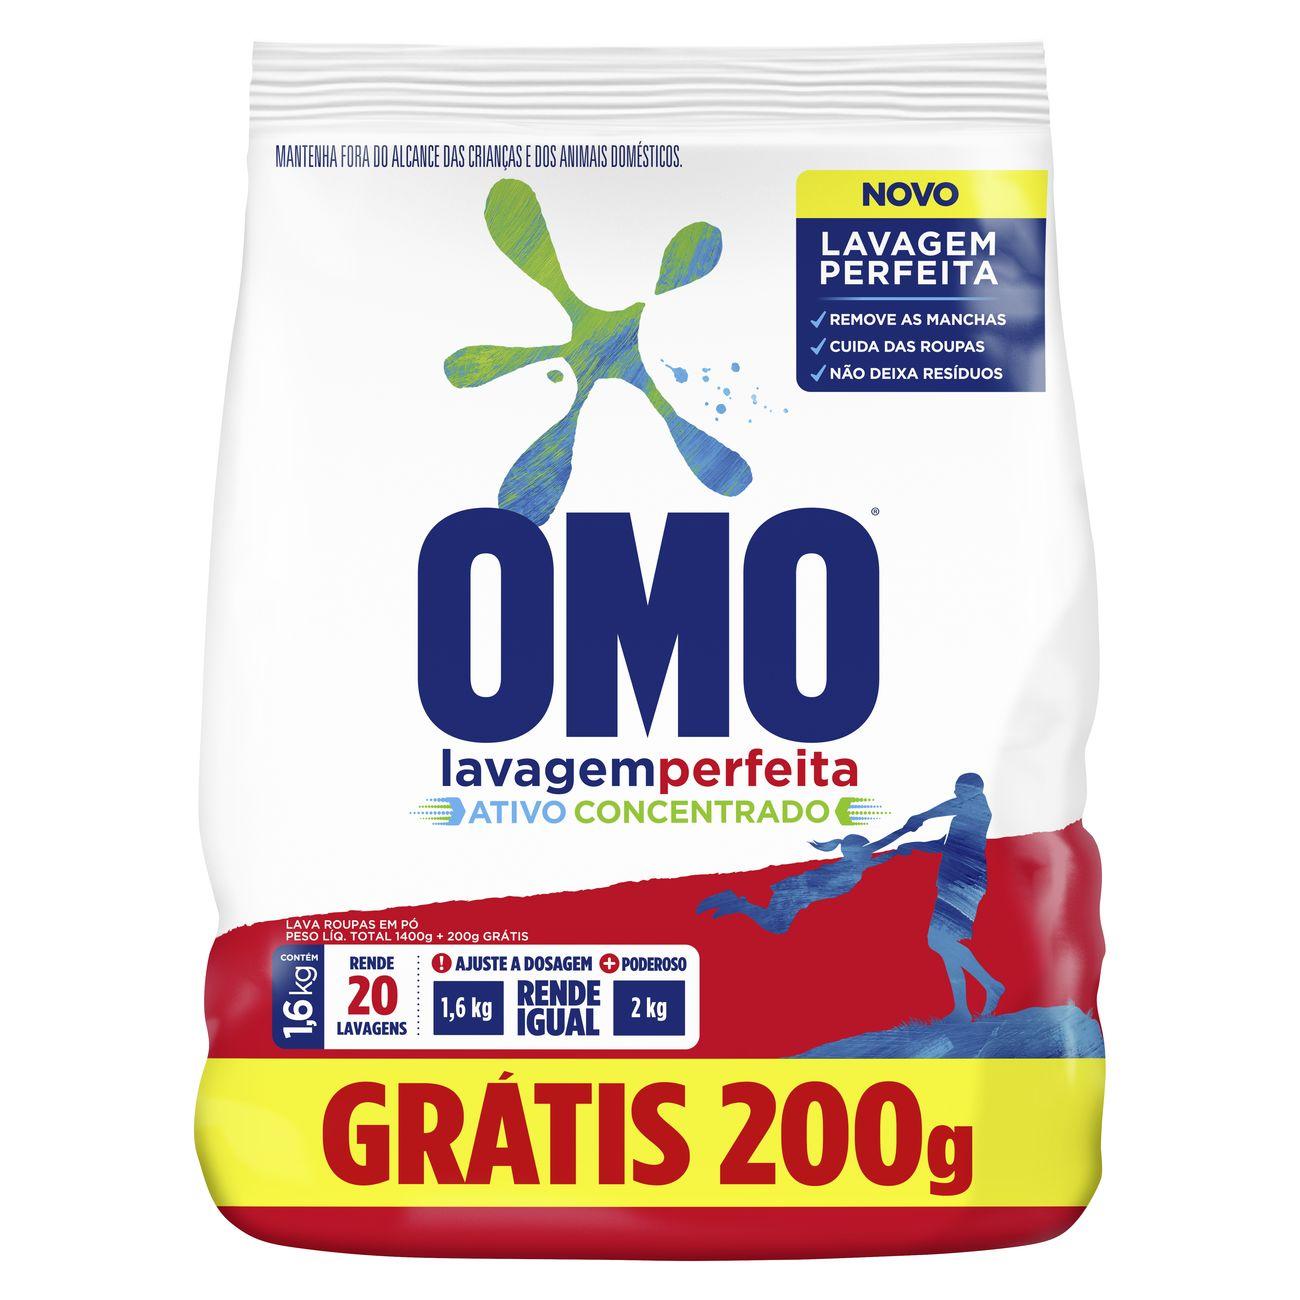 Oferta Detergente em Pó OMO Pague 1,4kg Leve 1,6kg